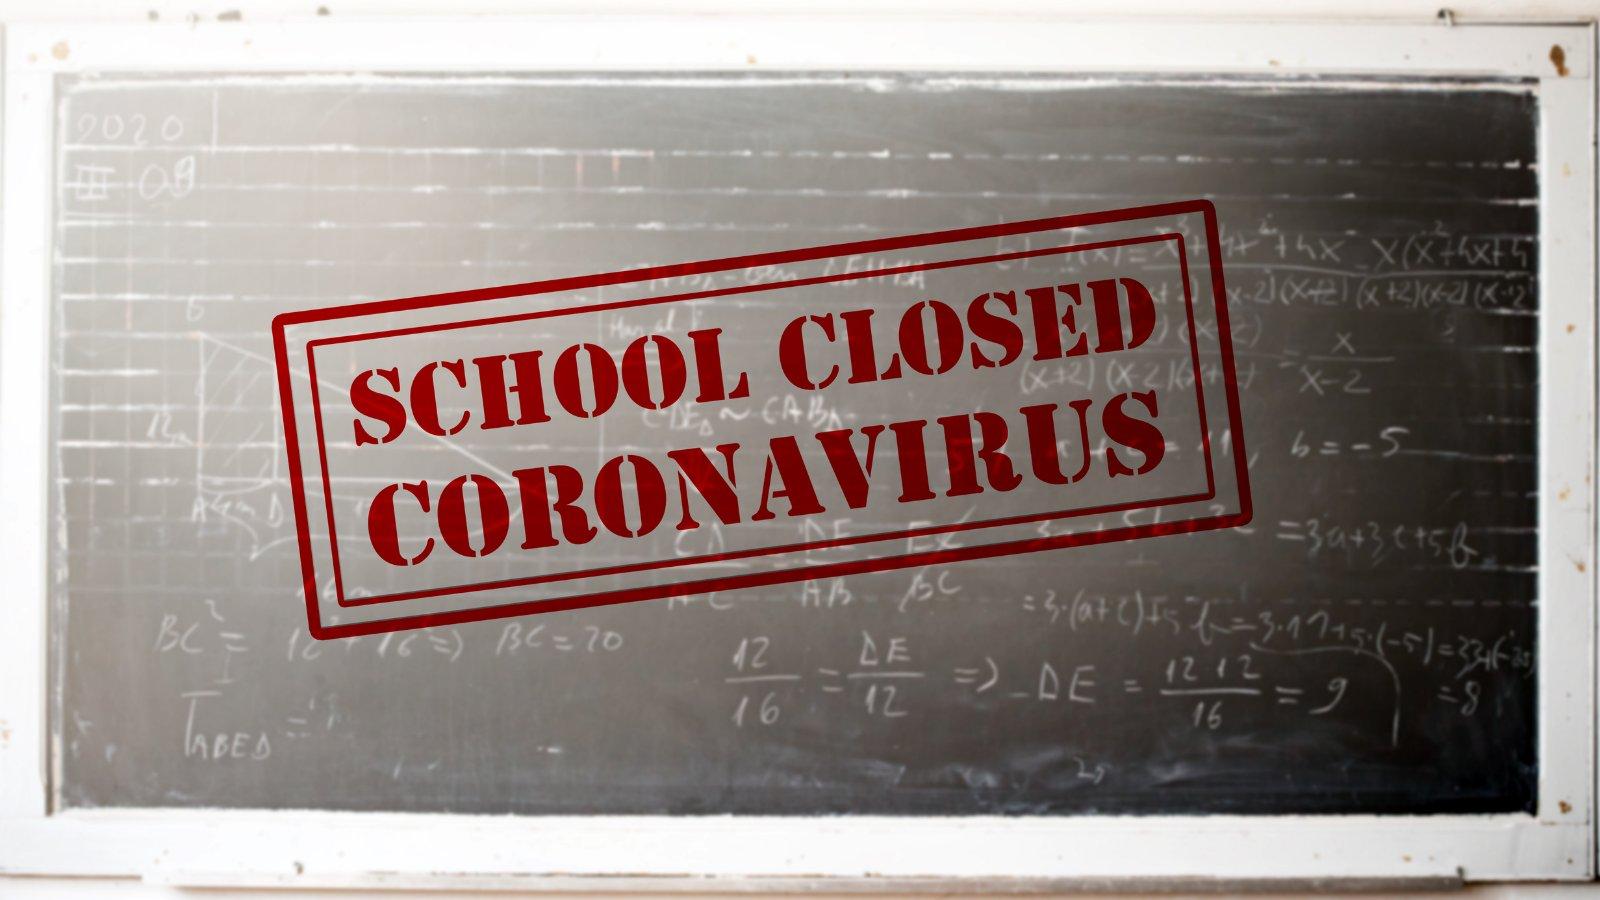 Schools_closed_coronovirus.jpg